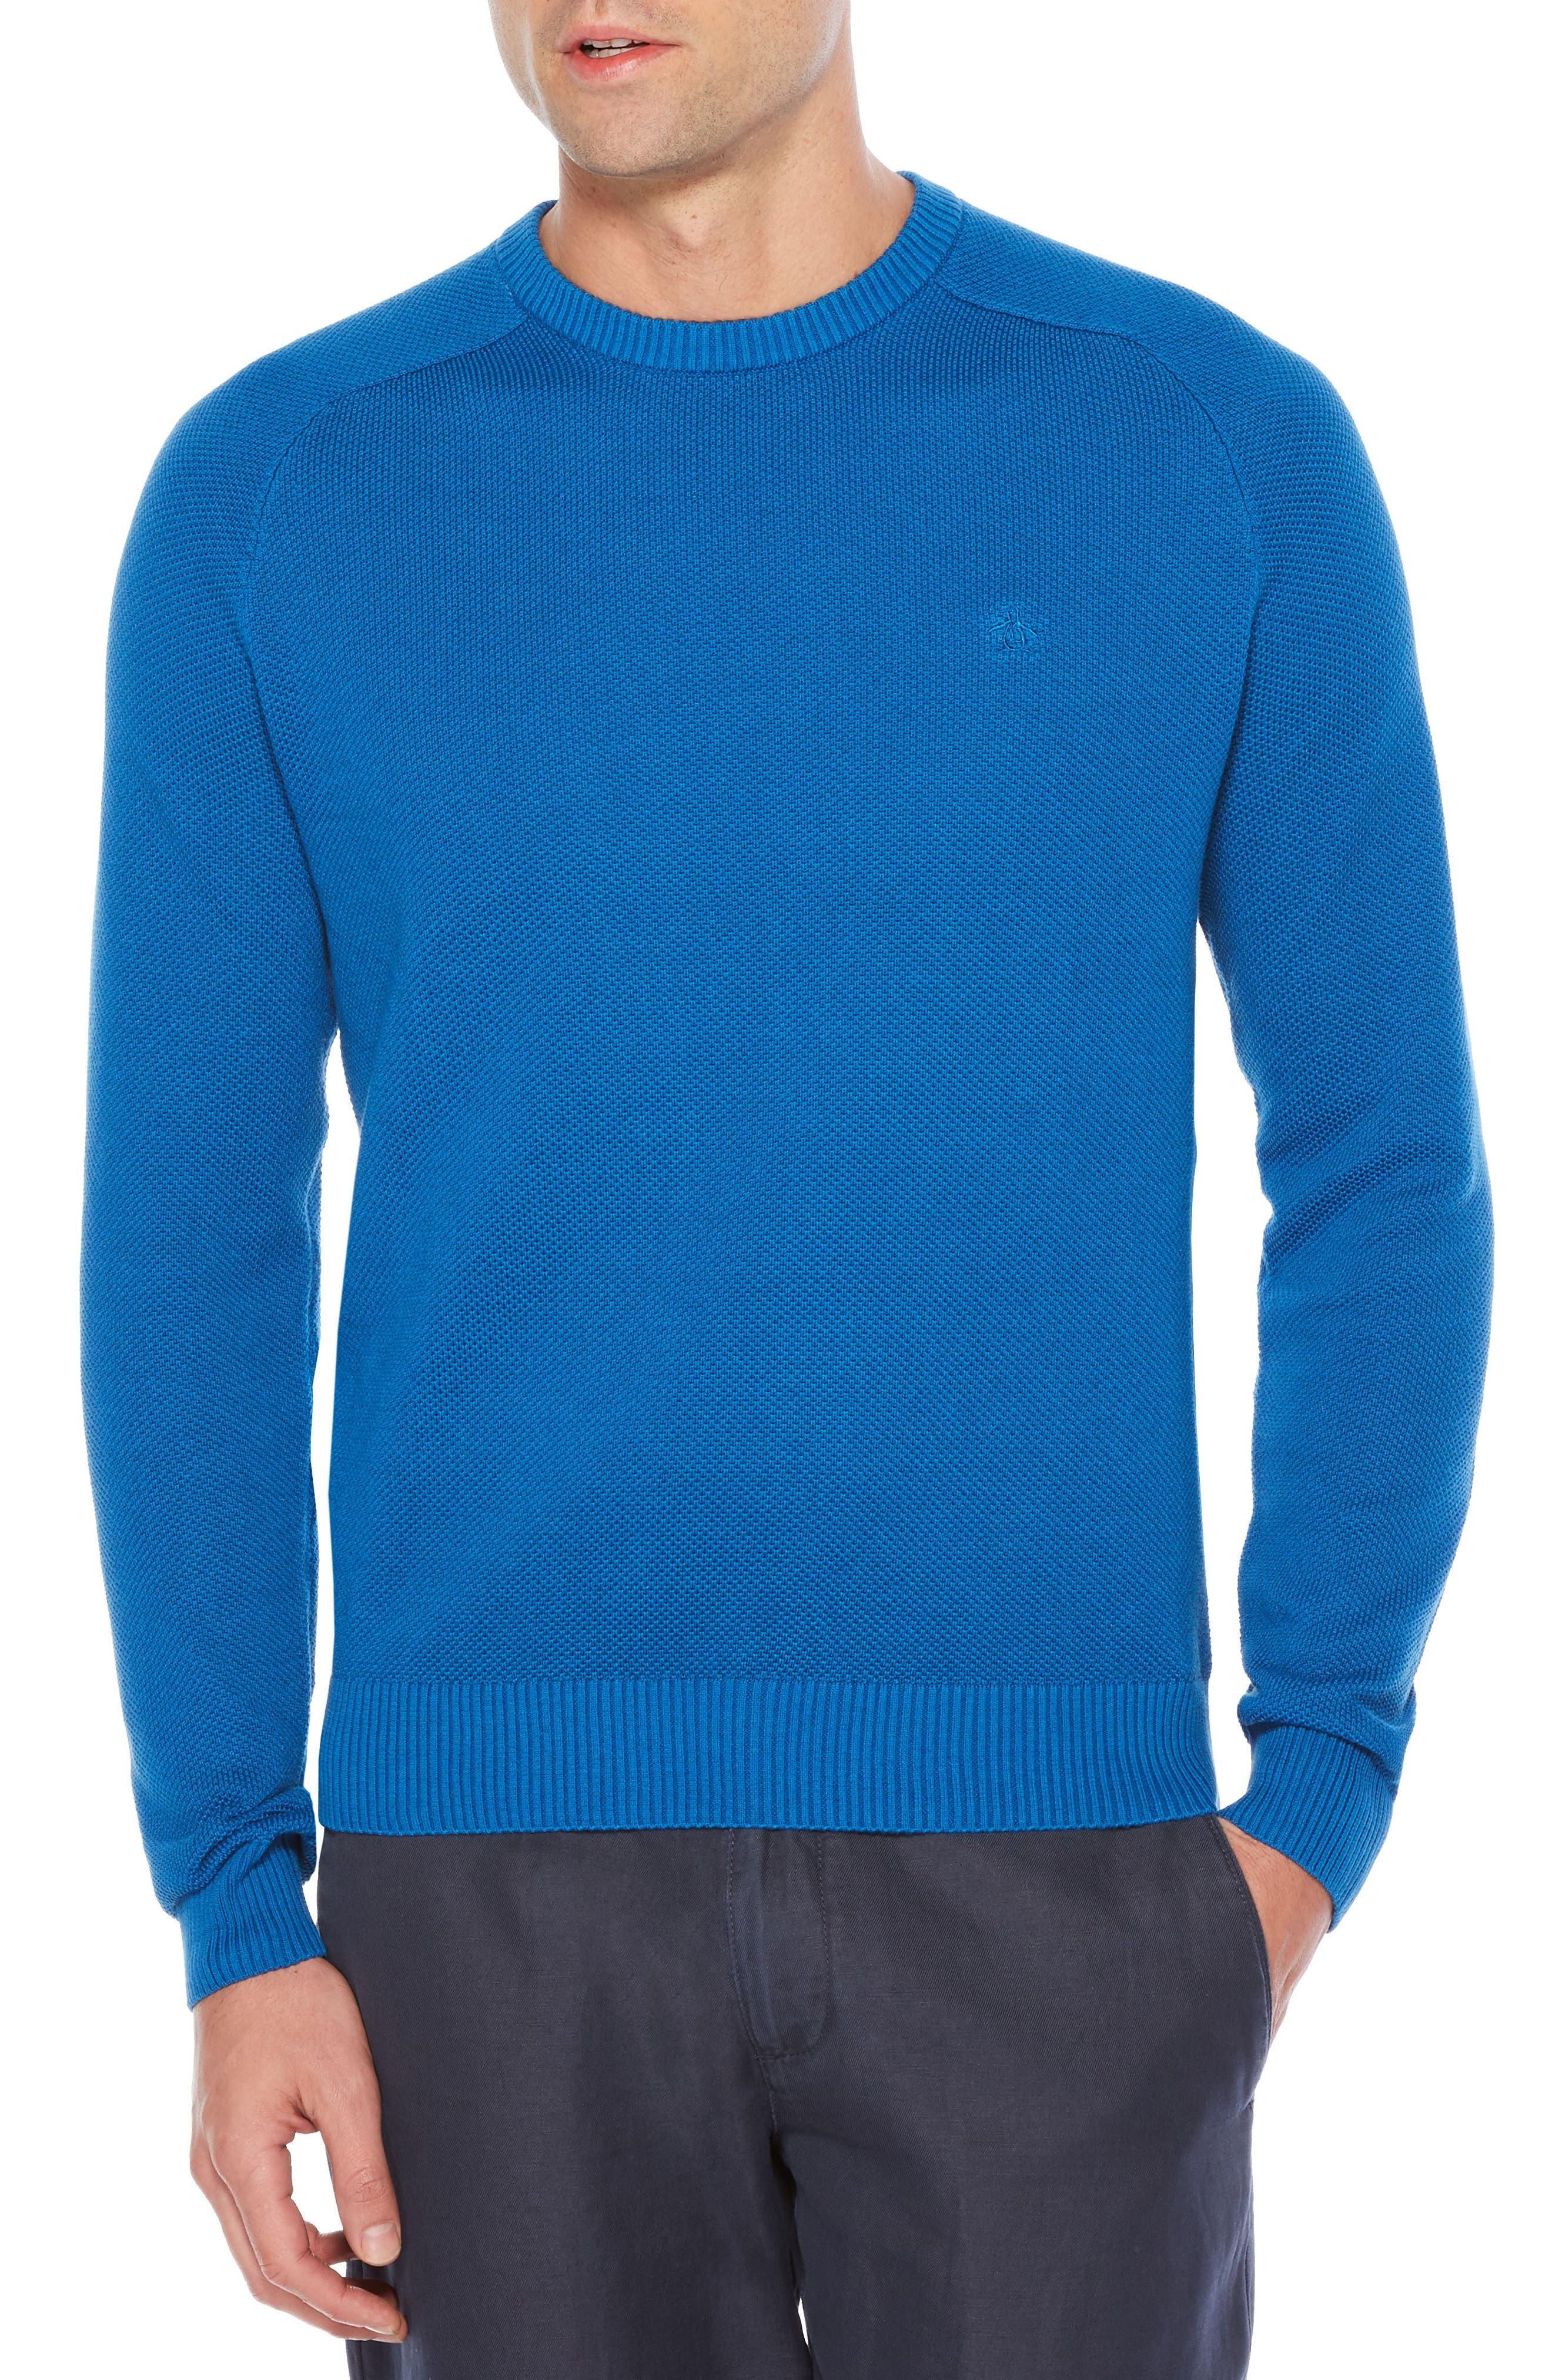 Main Image - Original Penguin Honeycomb Piqué Sweater